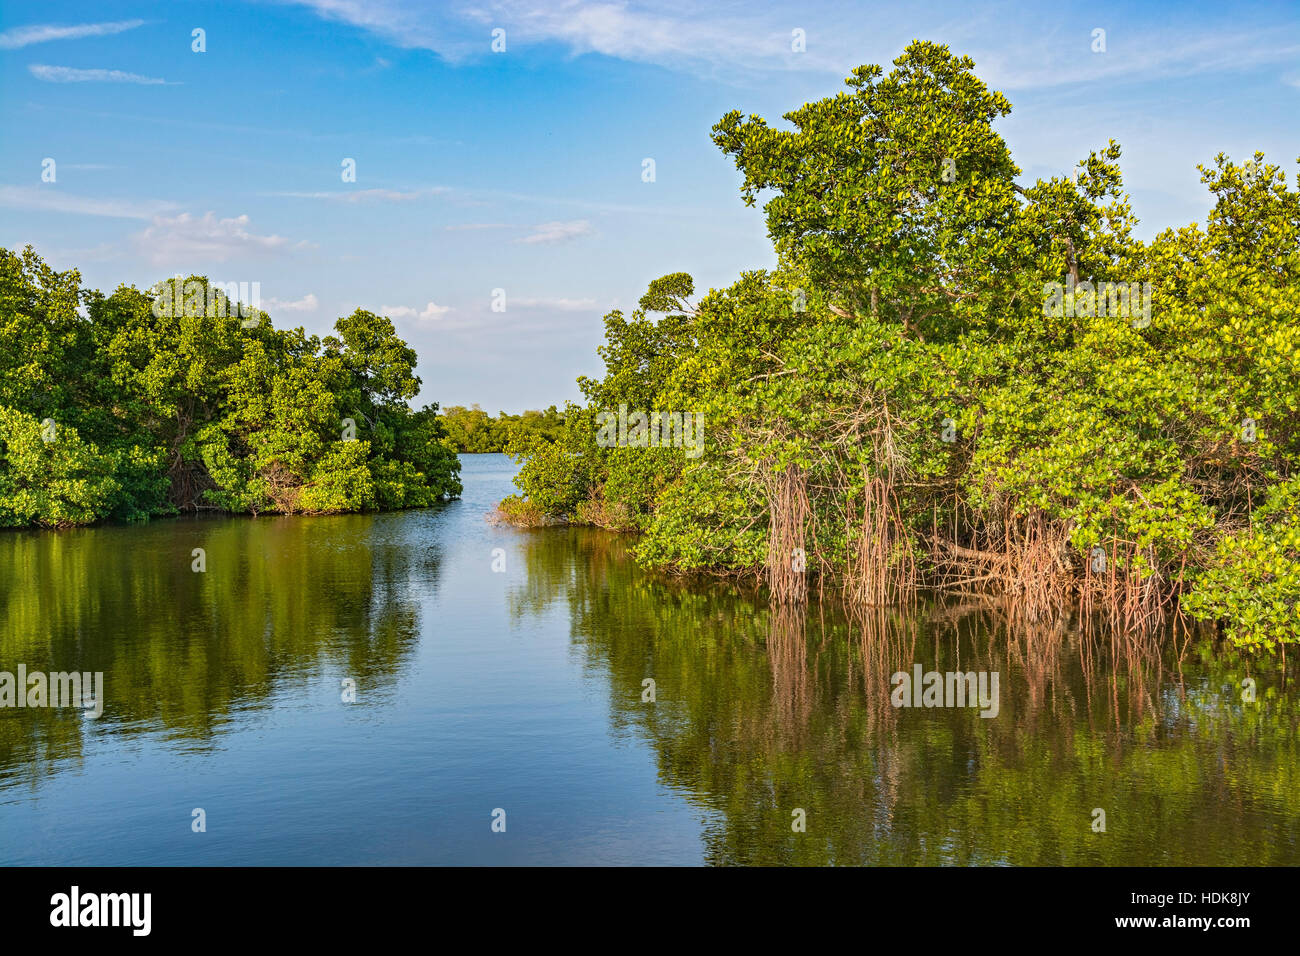 Florida, Sanibel Island, J.N. 'Ding' Darling National Wildlife Refuge, Wildlife Drive, Mangrove Trees - Stock Image